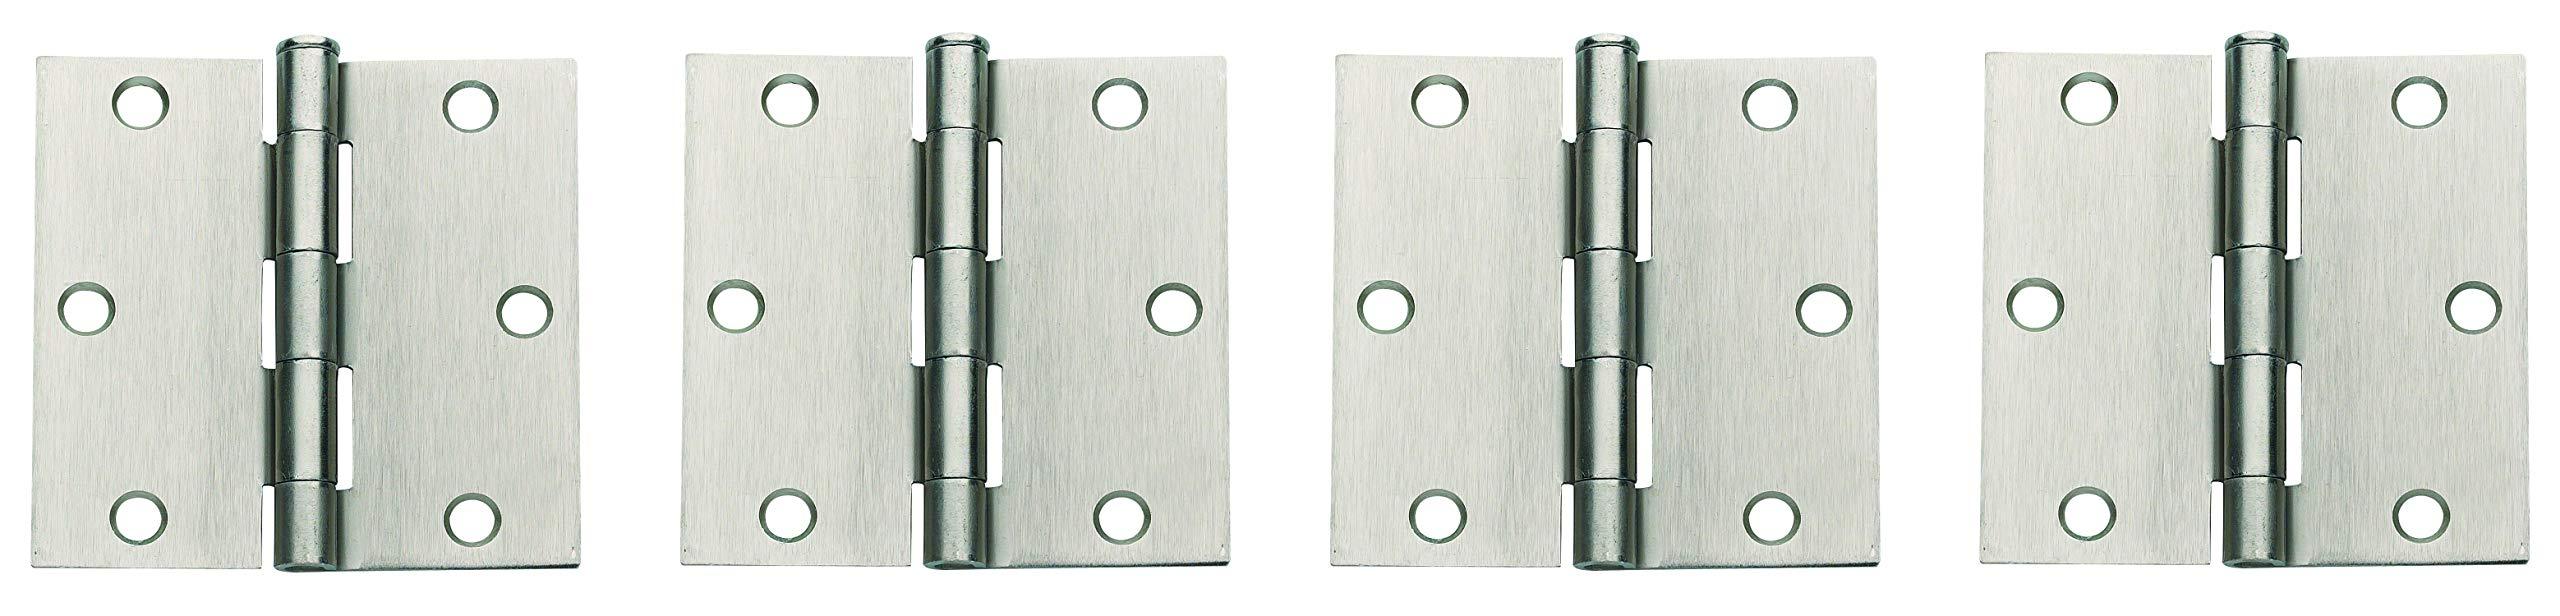 Global Door Controls 3.5 in. x 3.5 in. Satin Nickel Plain Bearing Steel Hinge - Set of 2 (Fоur Paсk)